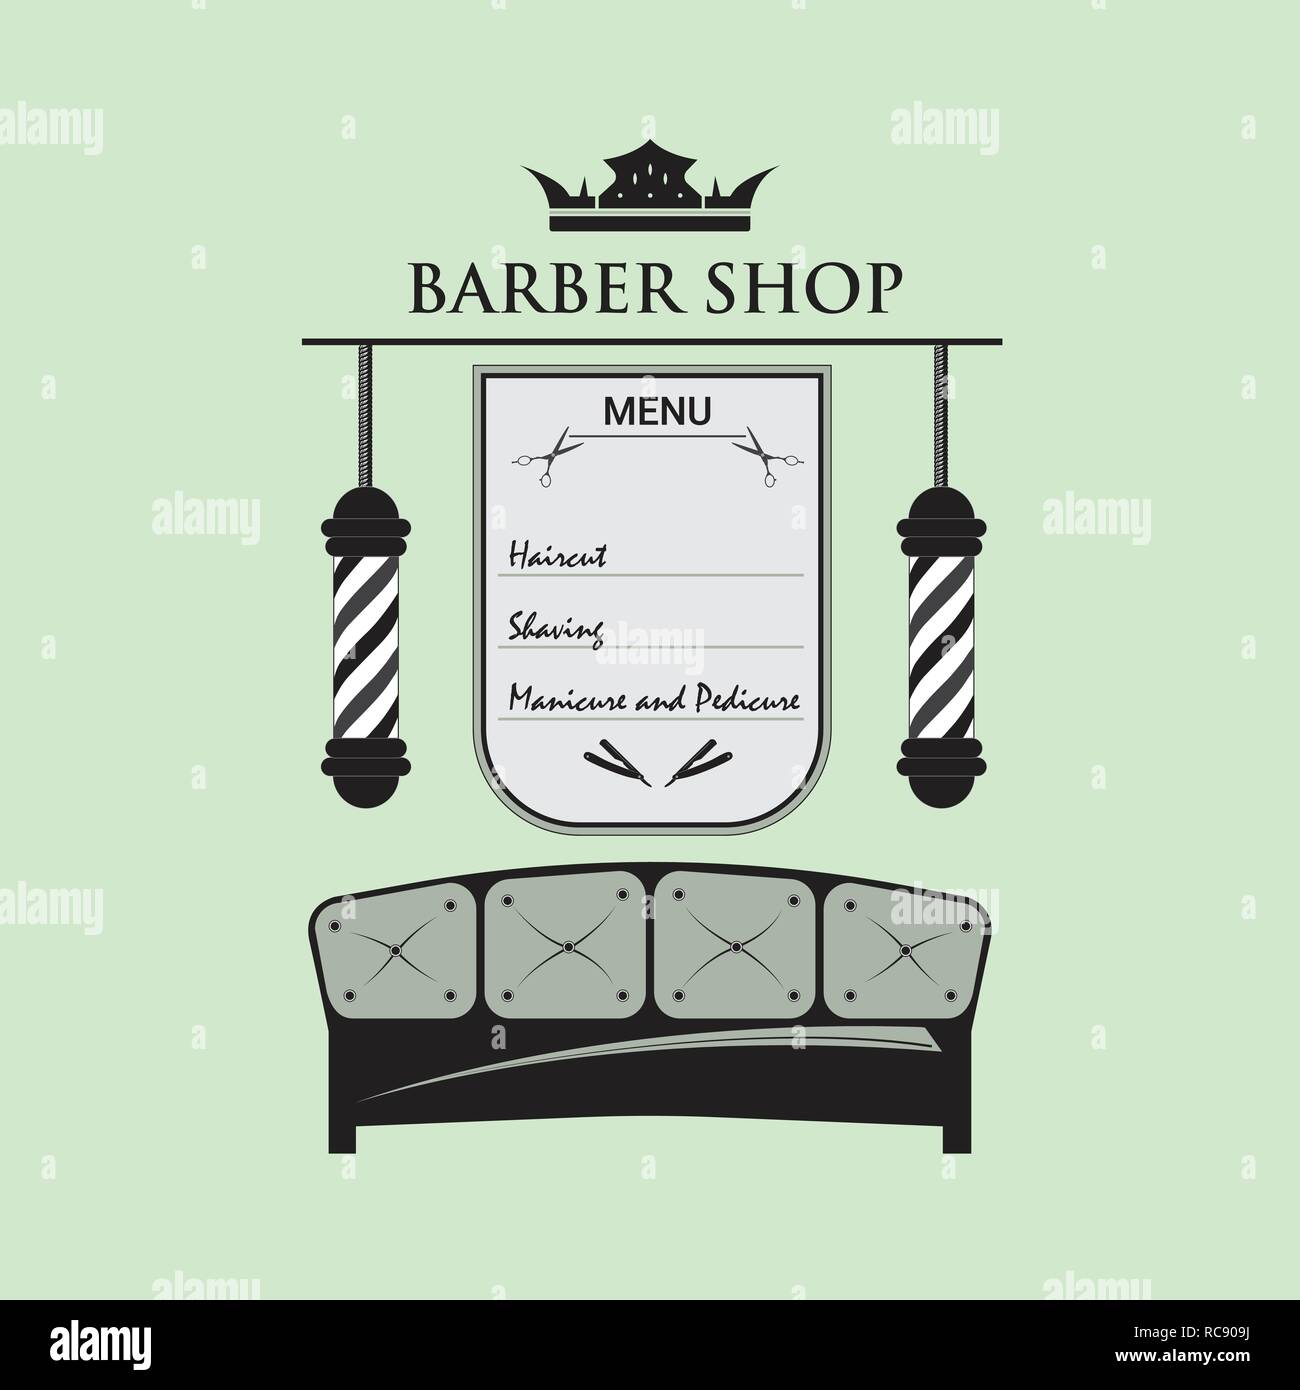 Barbershop Male Salon Stock Vector Art \u0026 Illustration